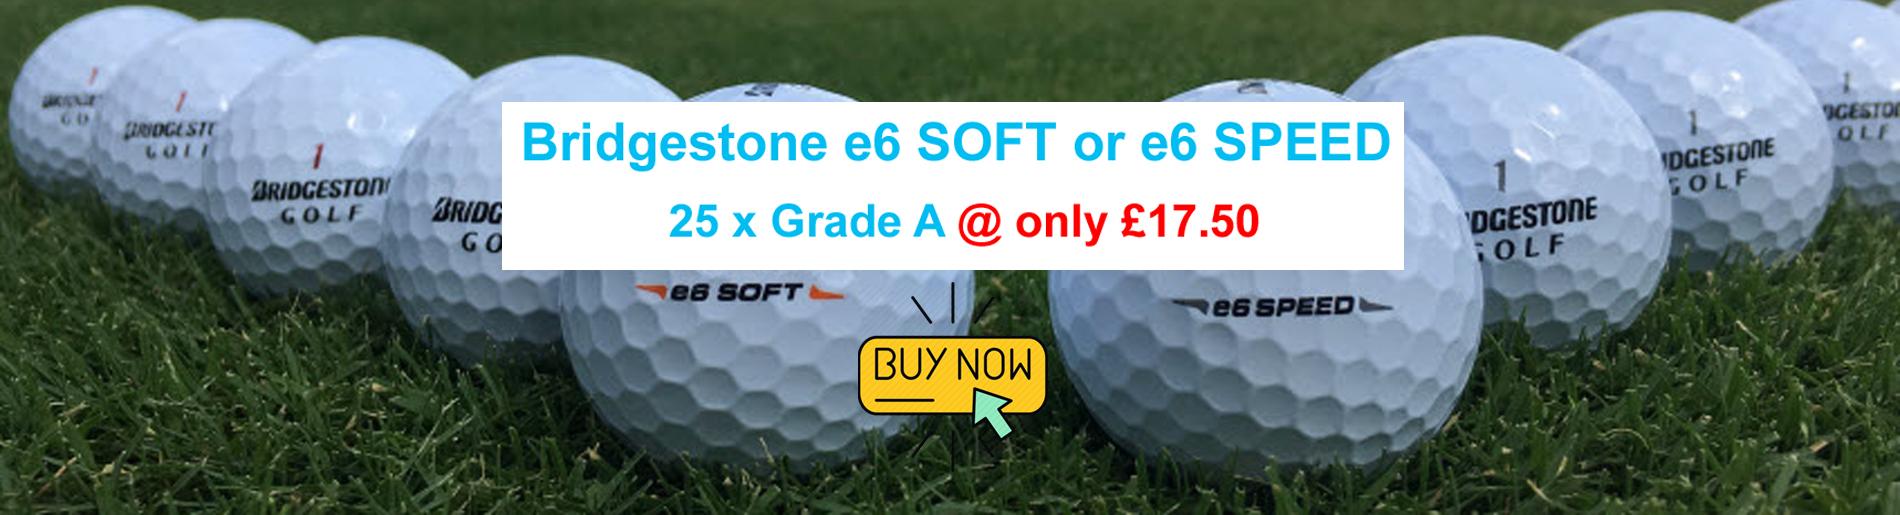 Bridgestone e6 Soft & e6 Speed